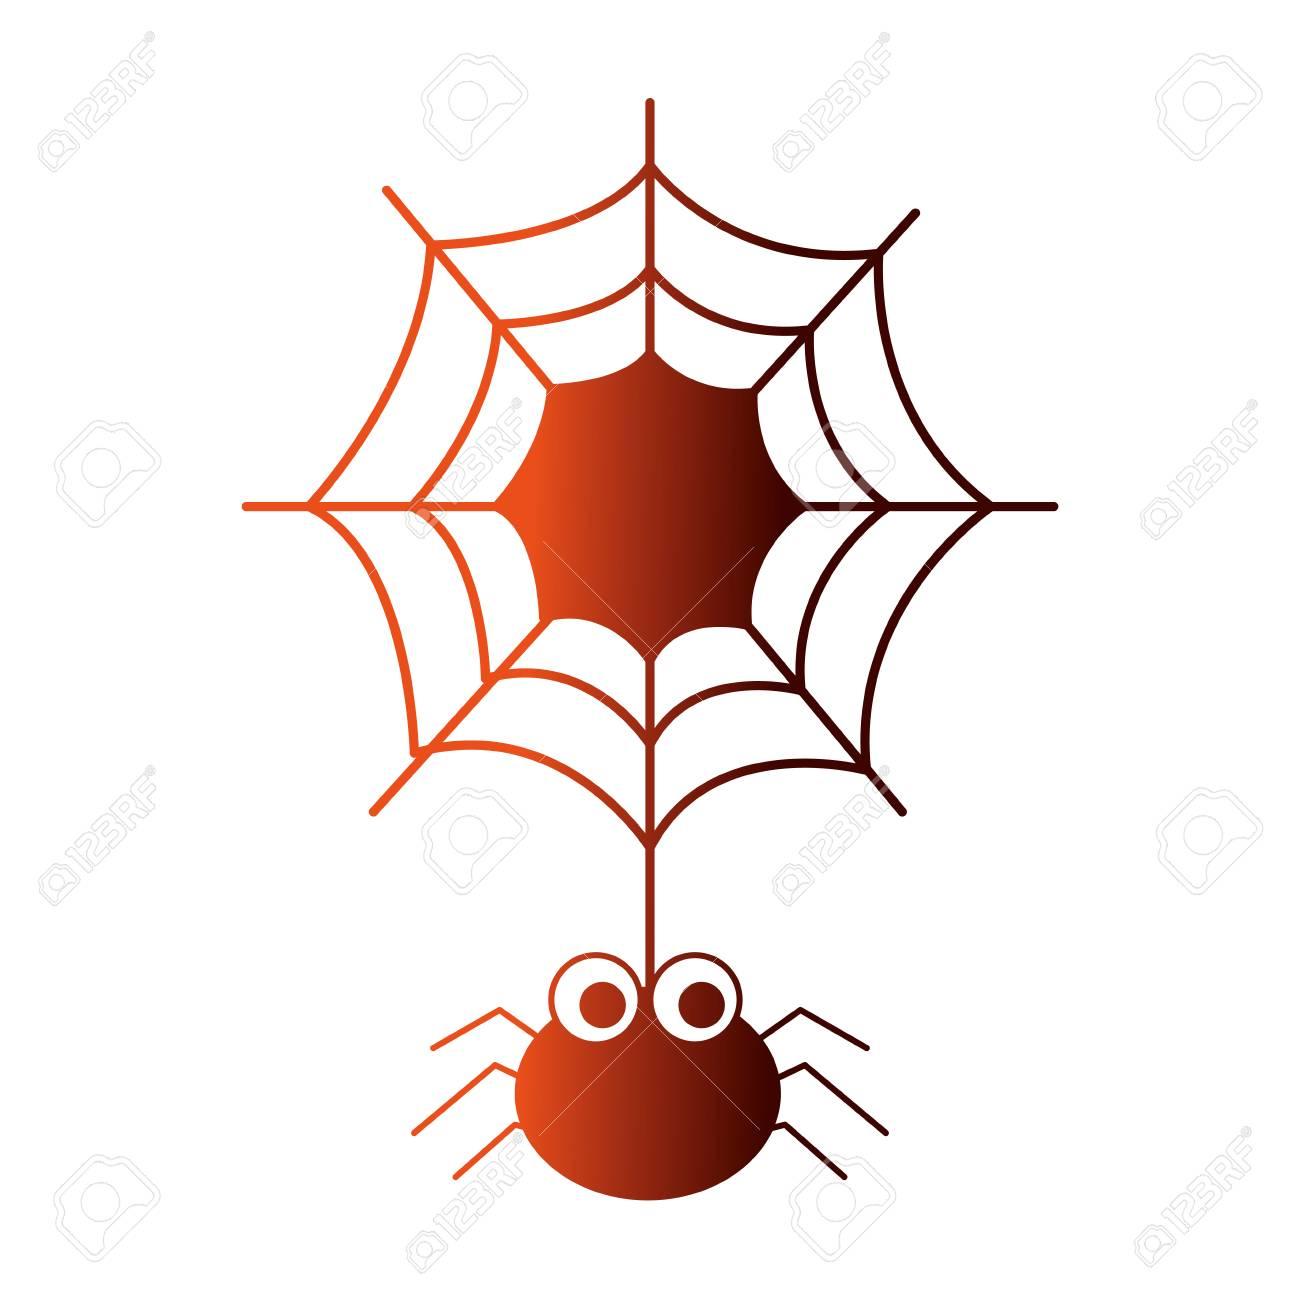 halloween spider with spiderweb isolated icon vector illustration design - 108572987